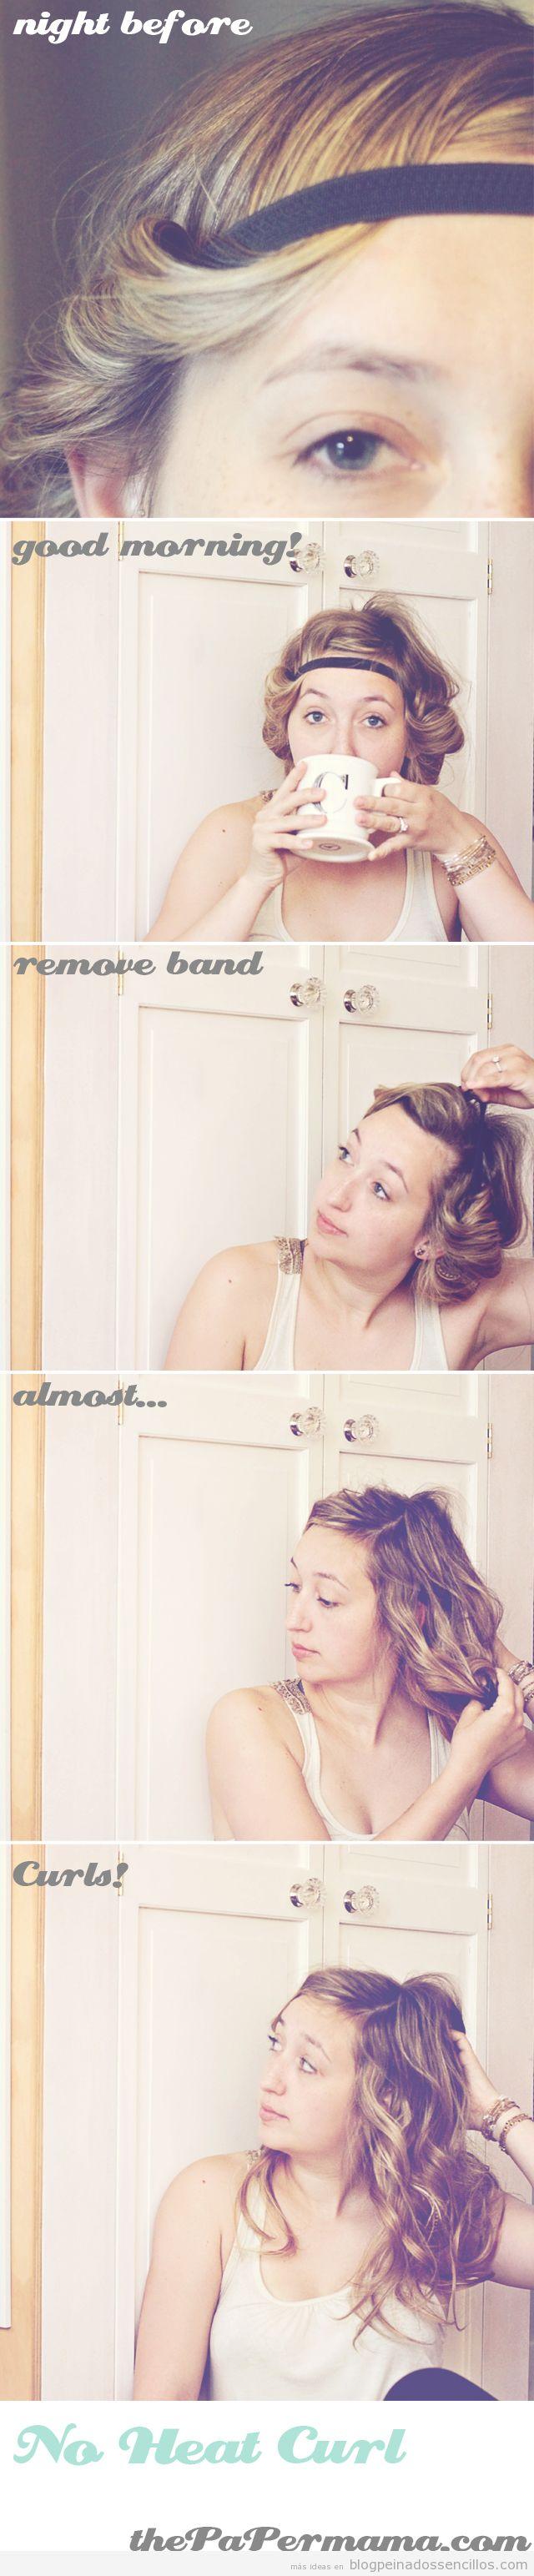 Tutorial truco tutorial ondular y rizar pelo con diadema